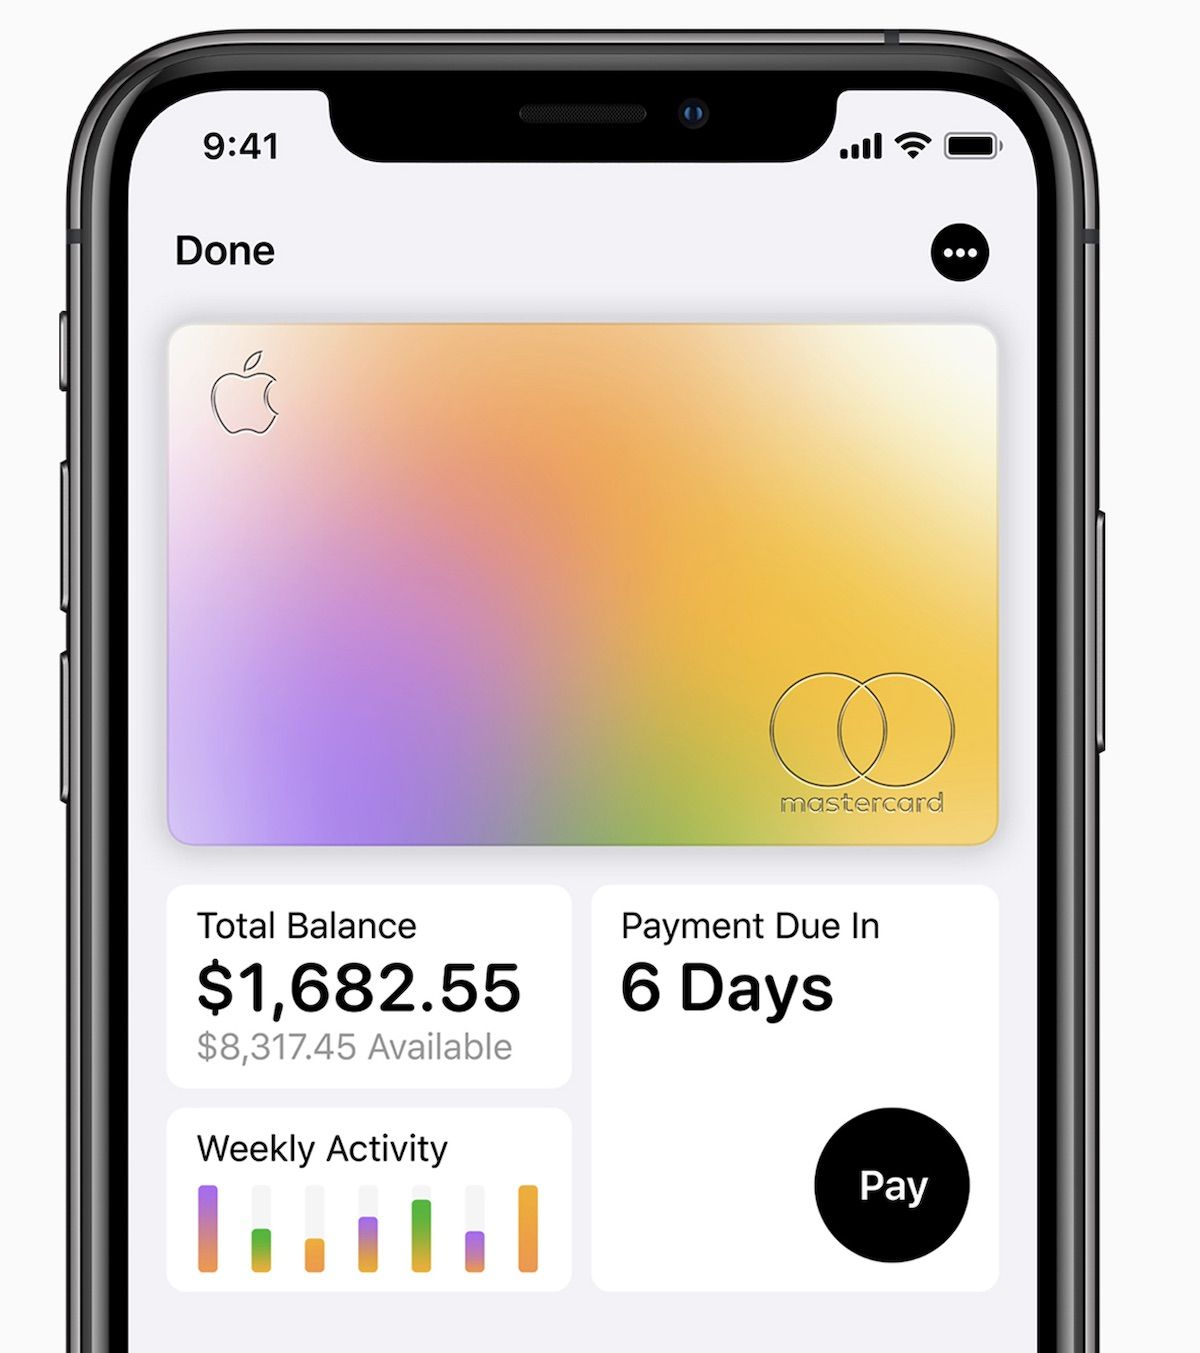 Account Suspended Iphone rumors, Digital wallet, Credit card